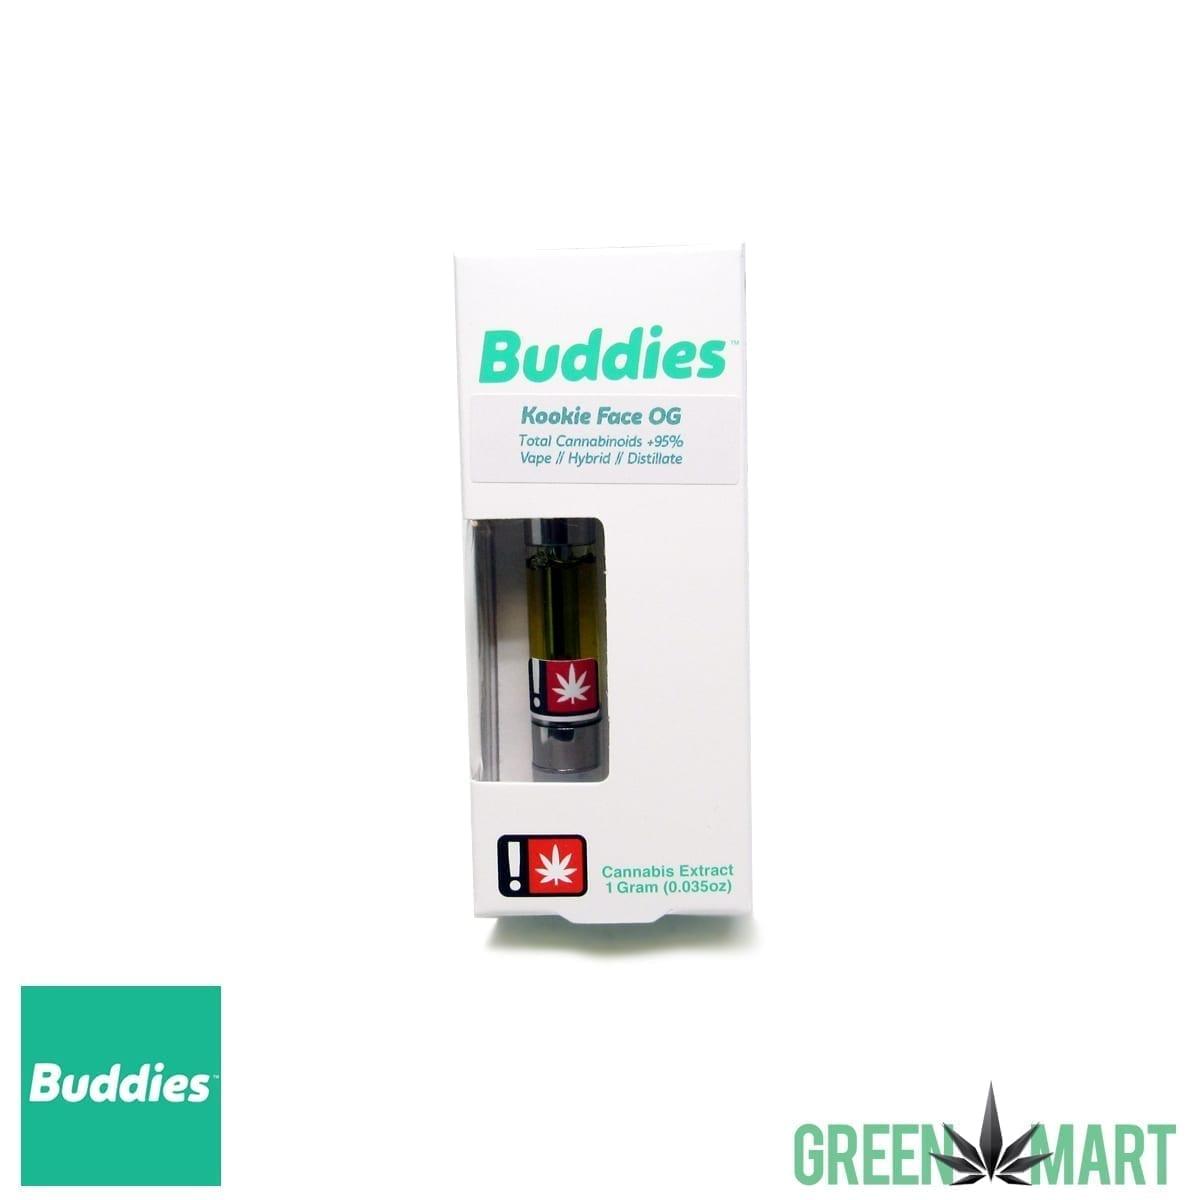 Buddies Brand Cartridges - Kookie Face OG